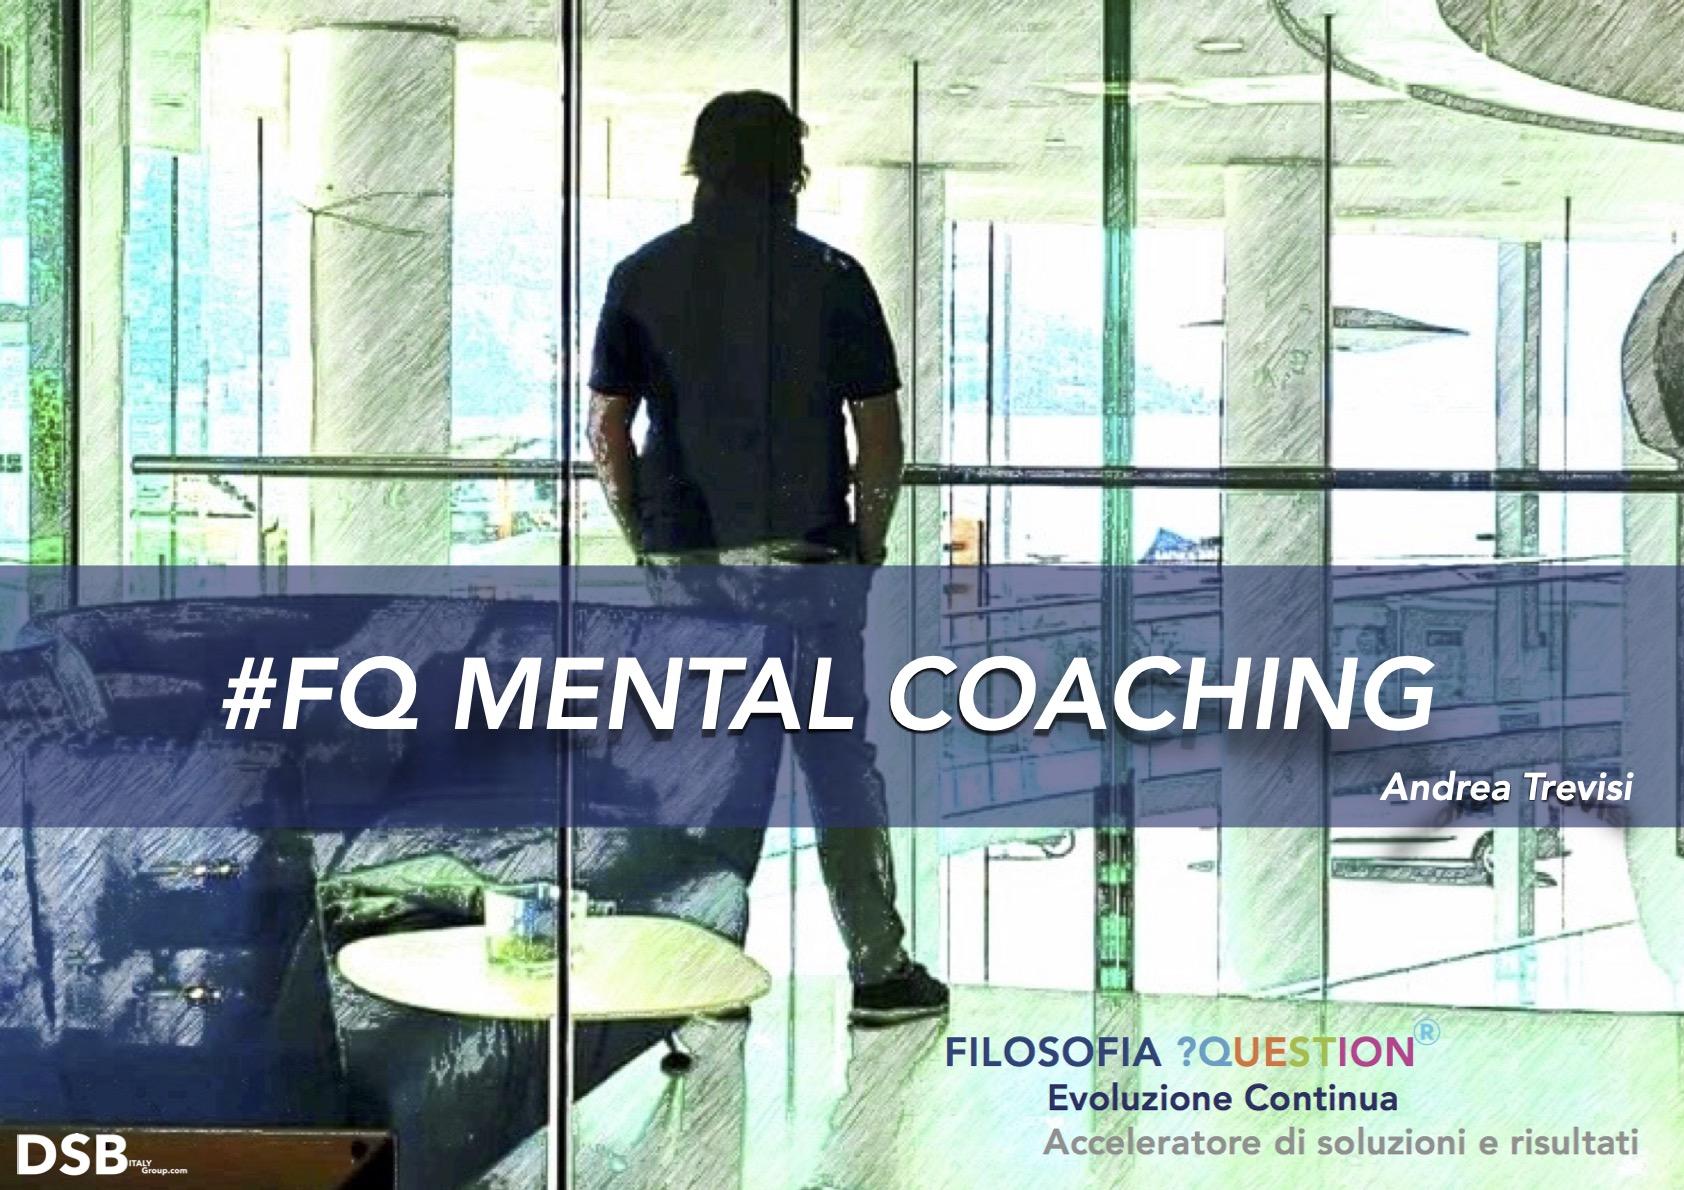 #FQ MENTAL COACHING